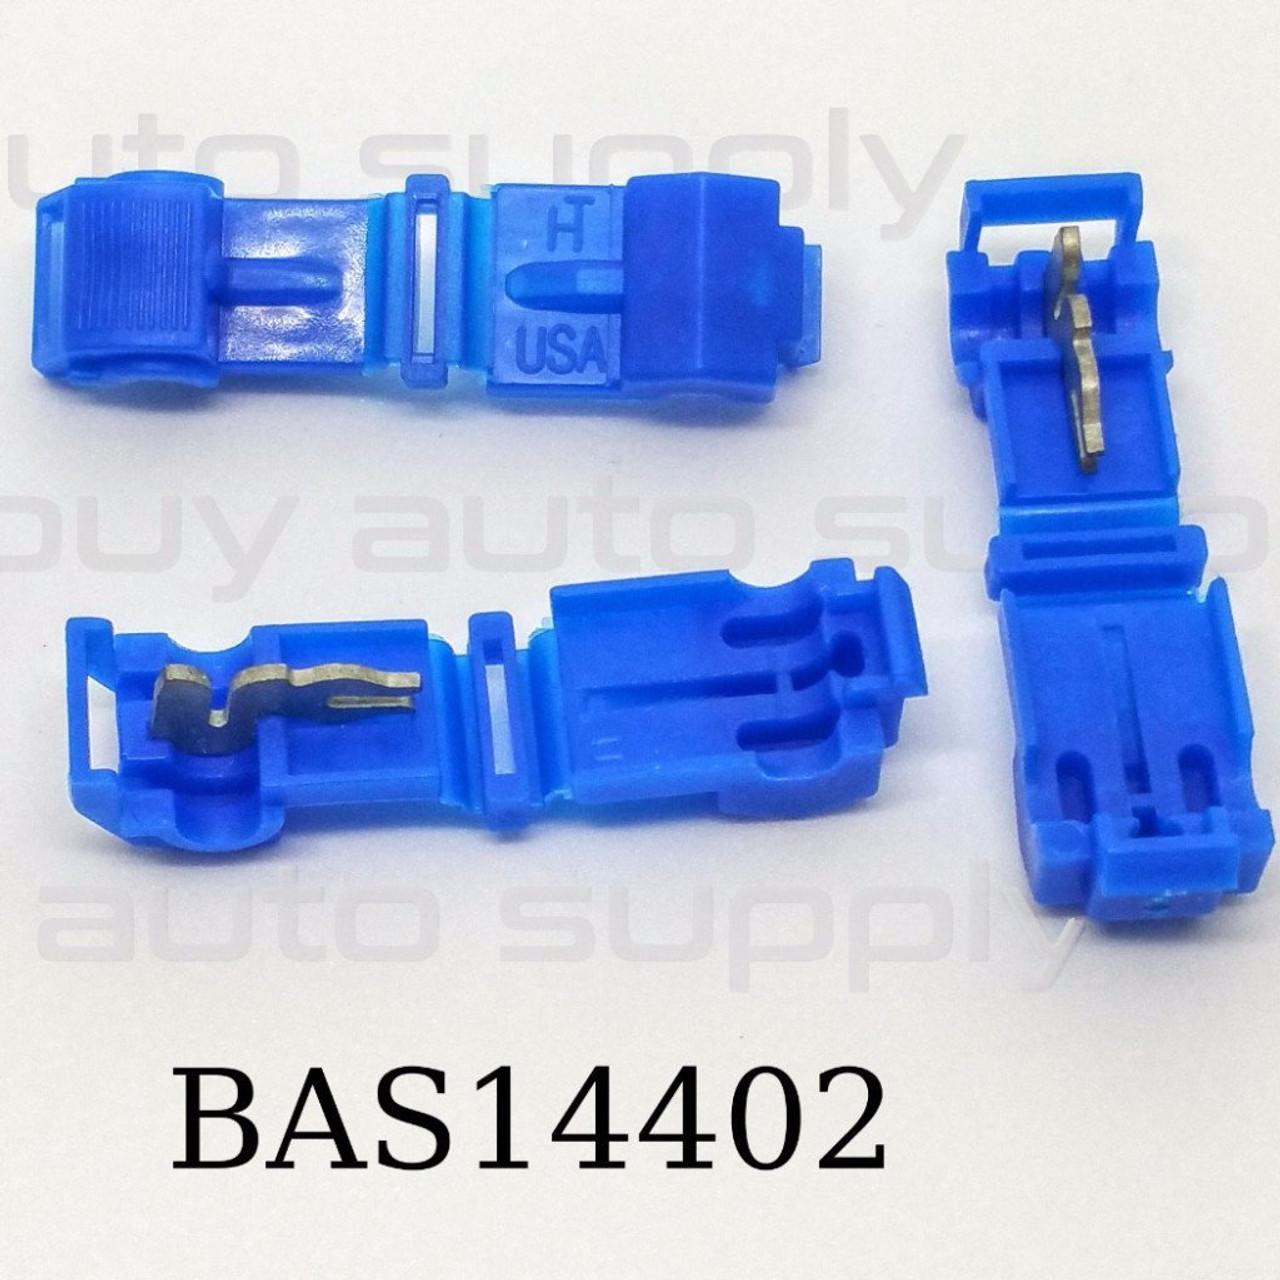 BAS14402 -USA Made- Blue T-Tap (16-14 AWG)